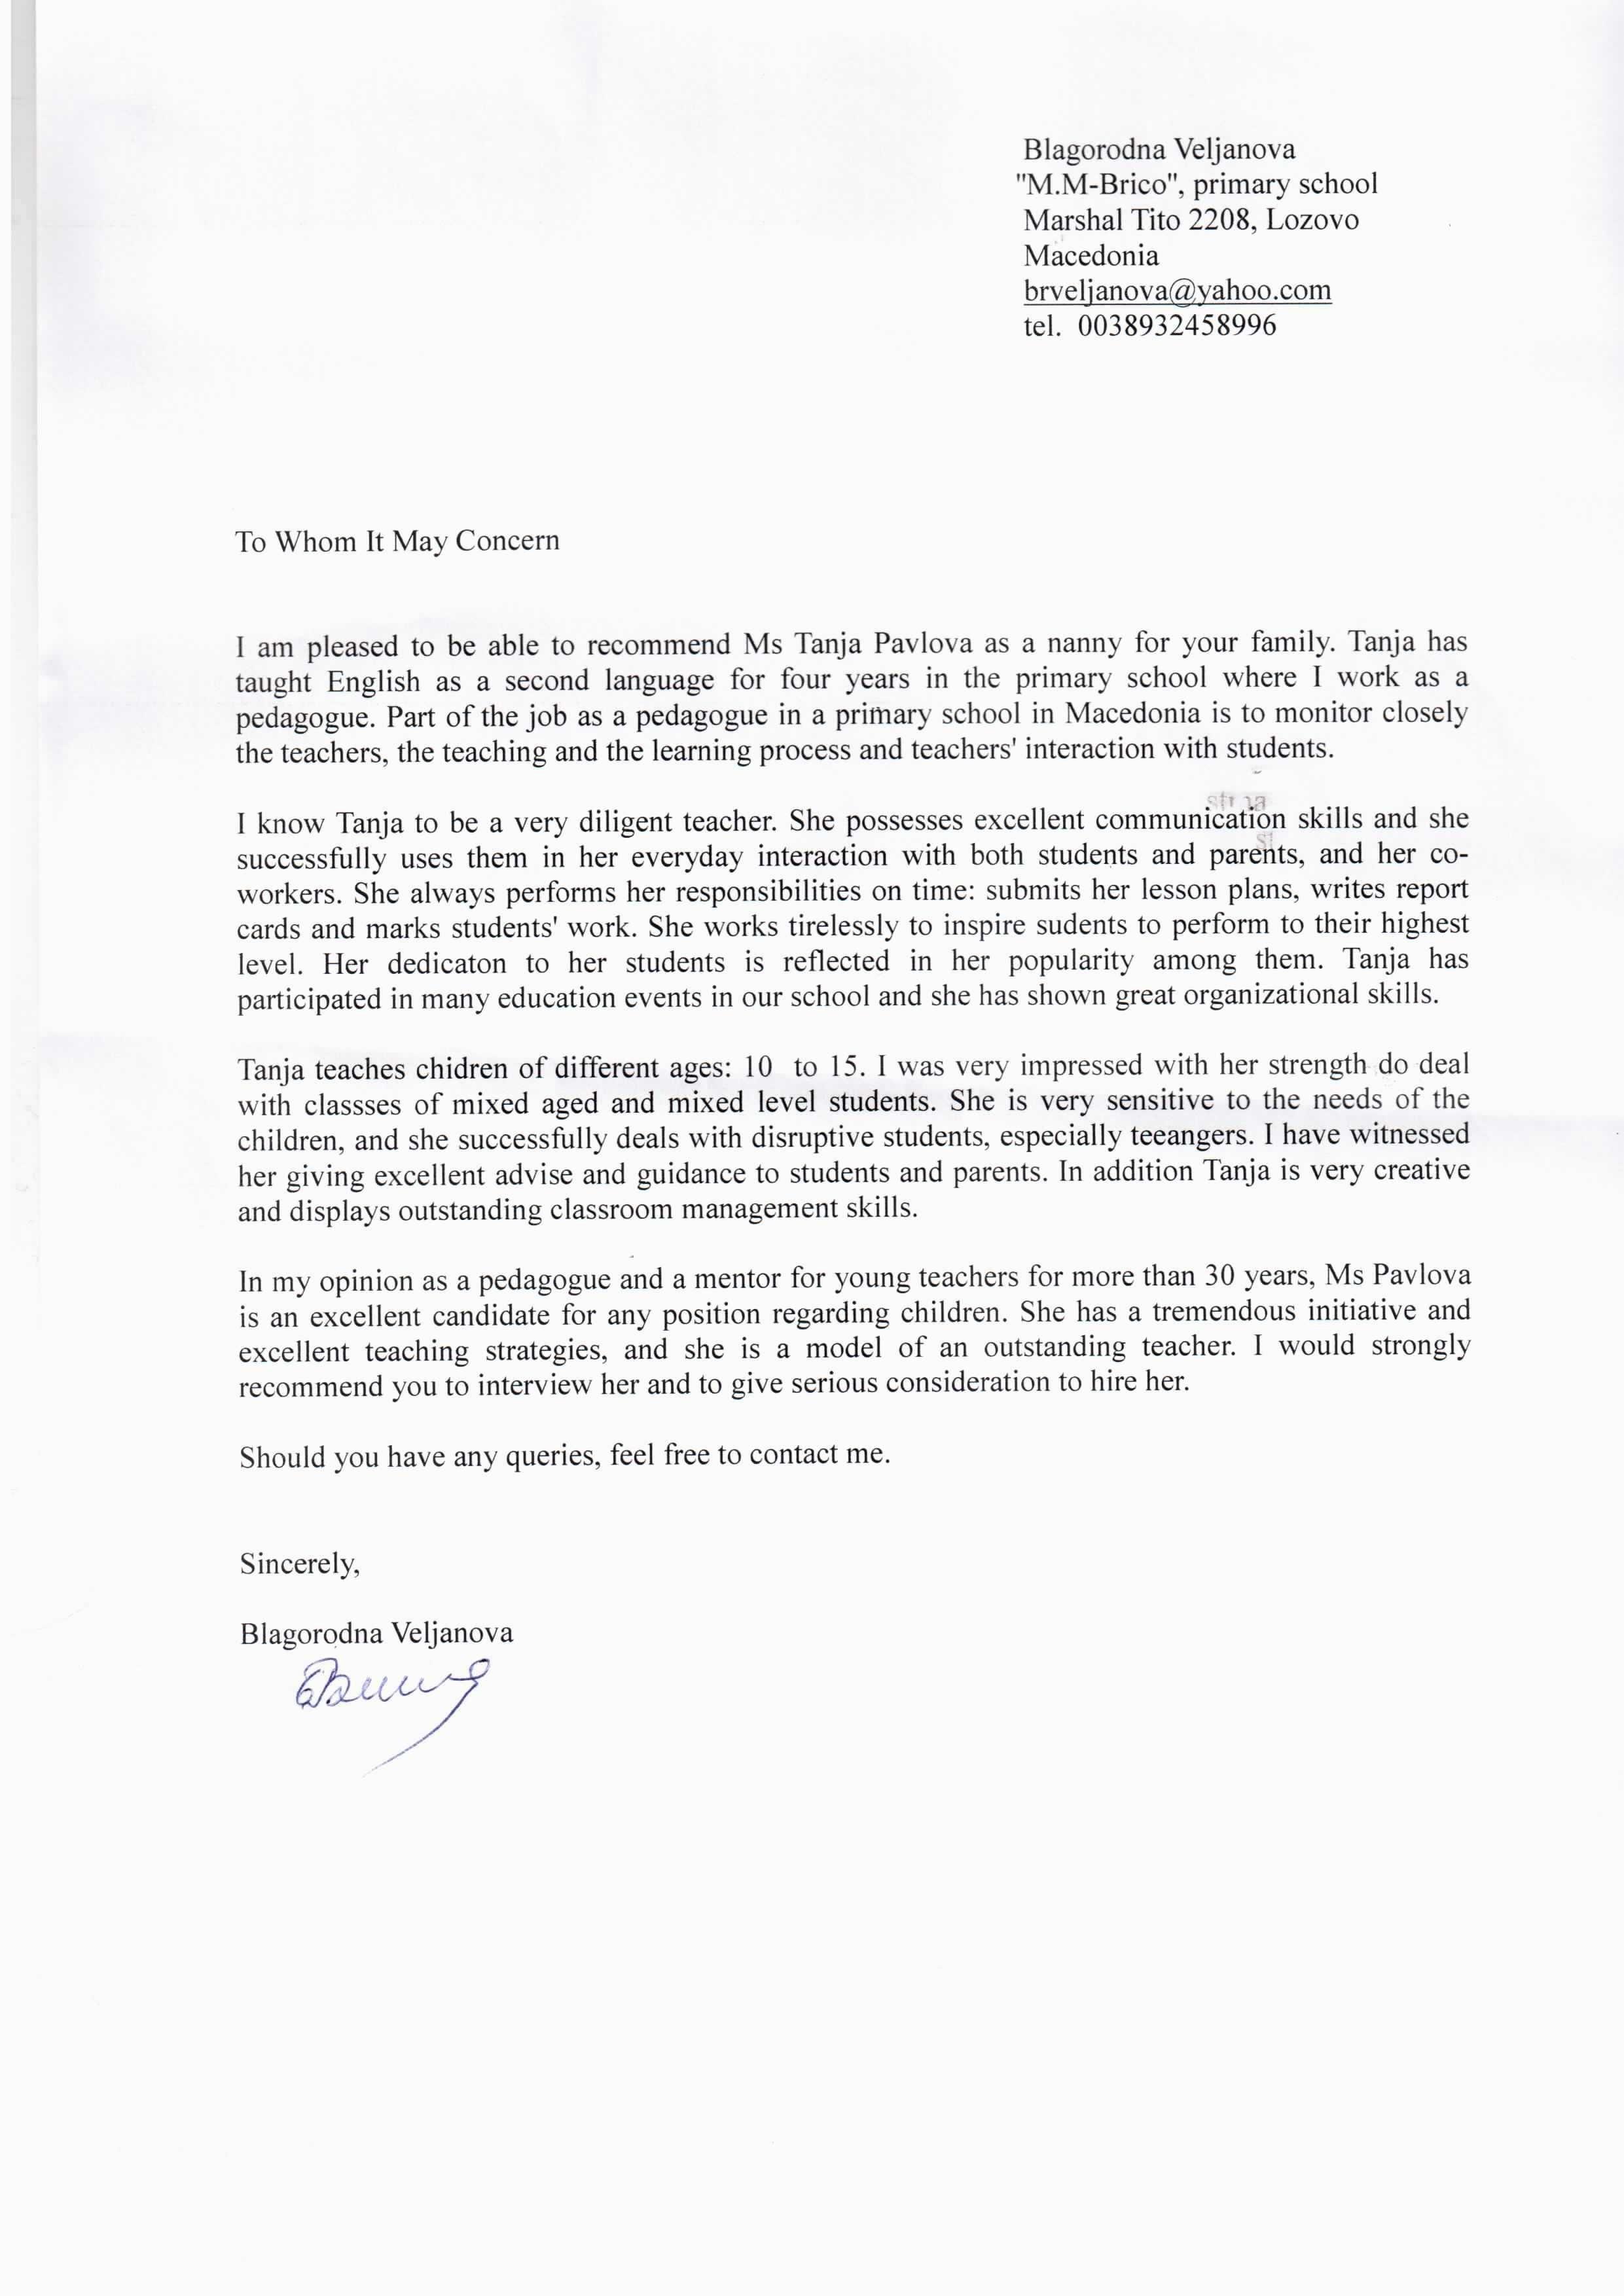 Letter Of Recommendation Nanny Lovely Reference Letter Template Au Pair New Reference Letter for